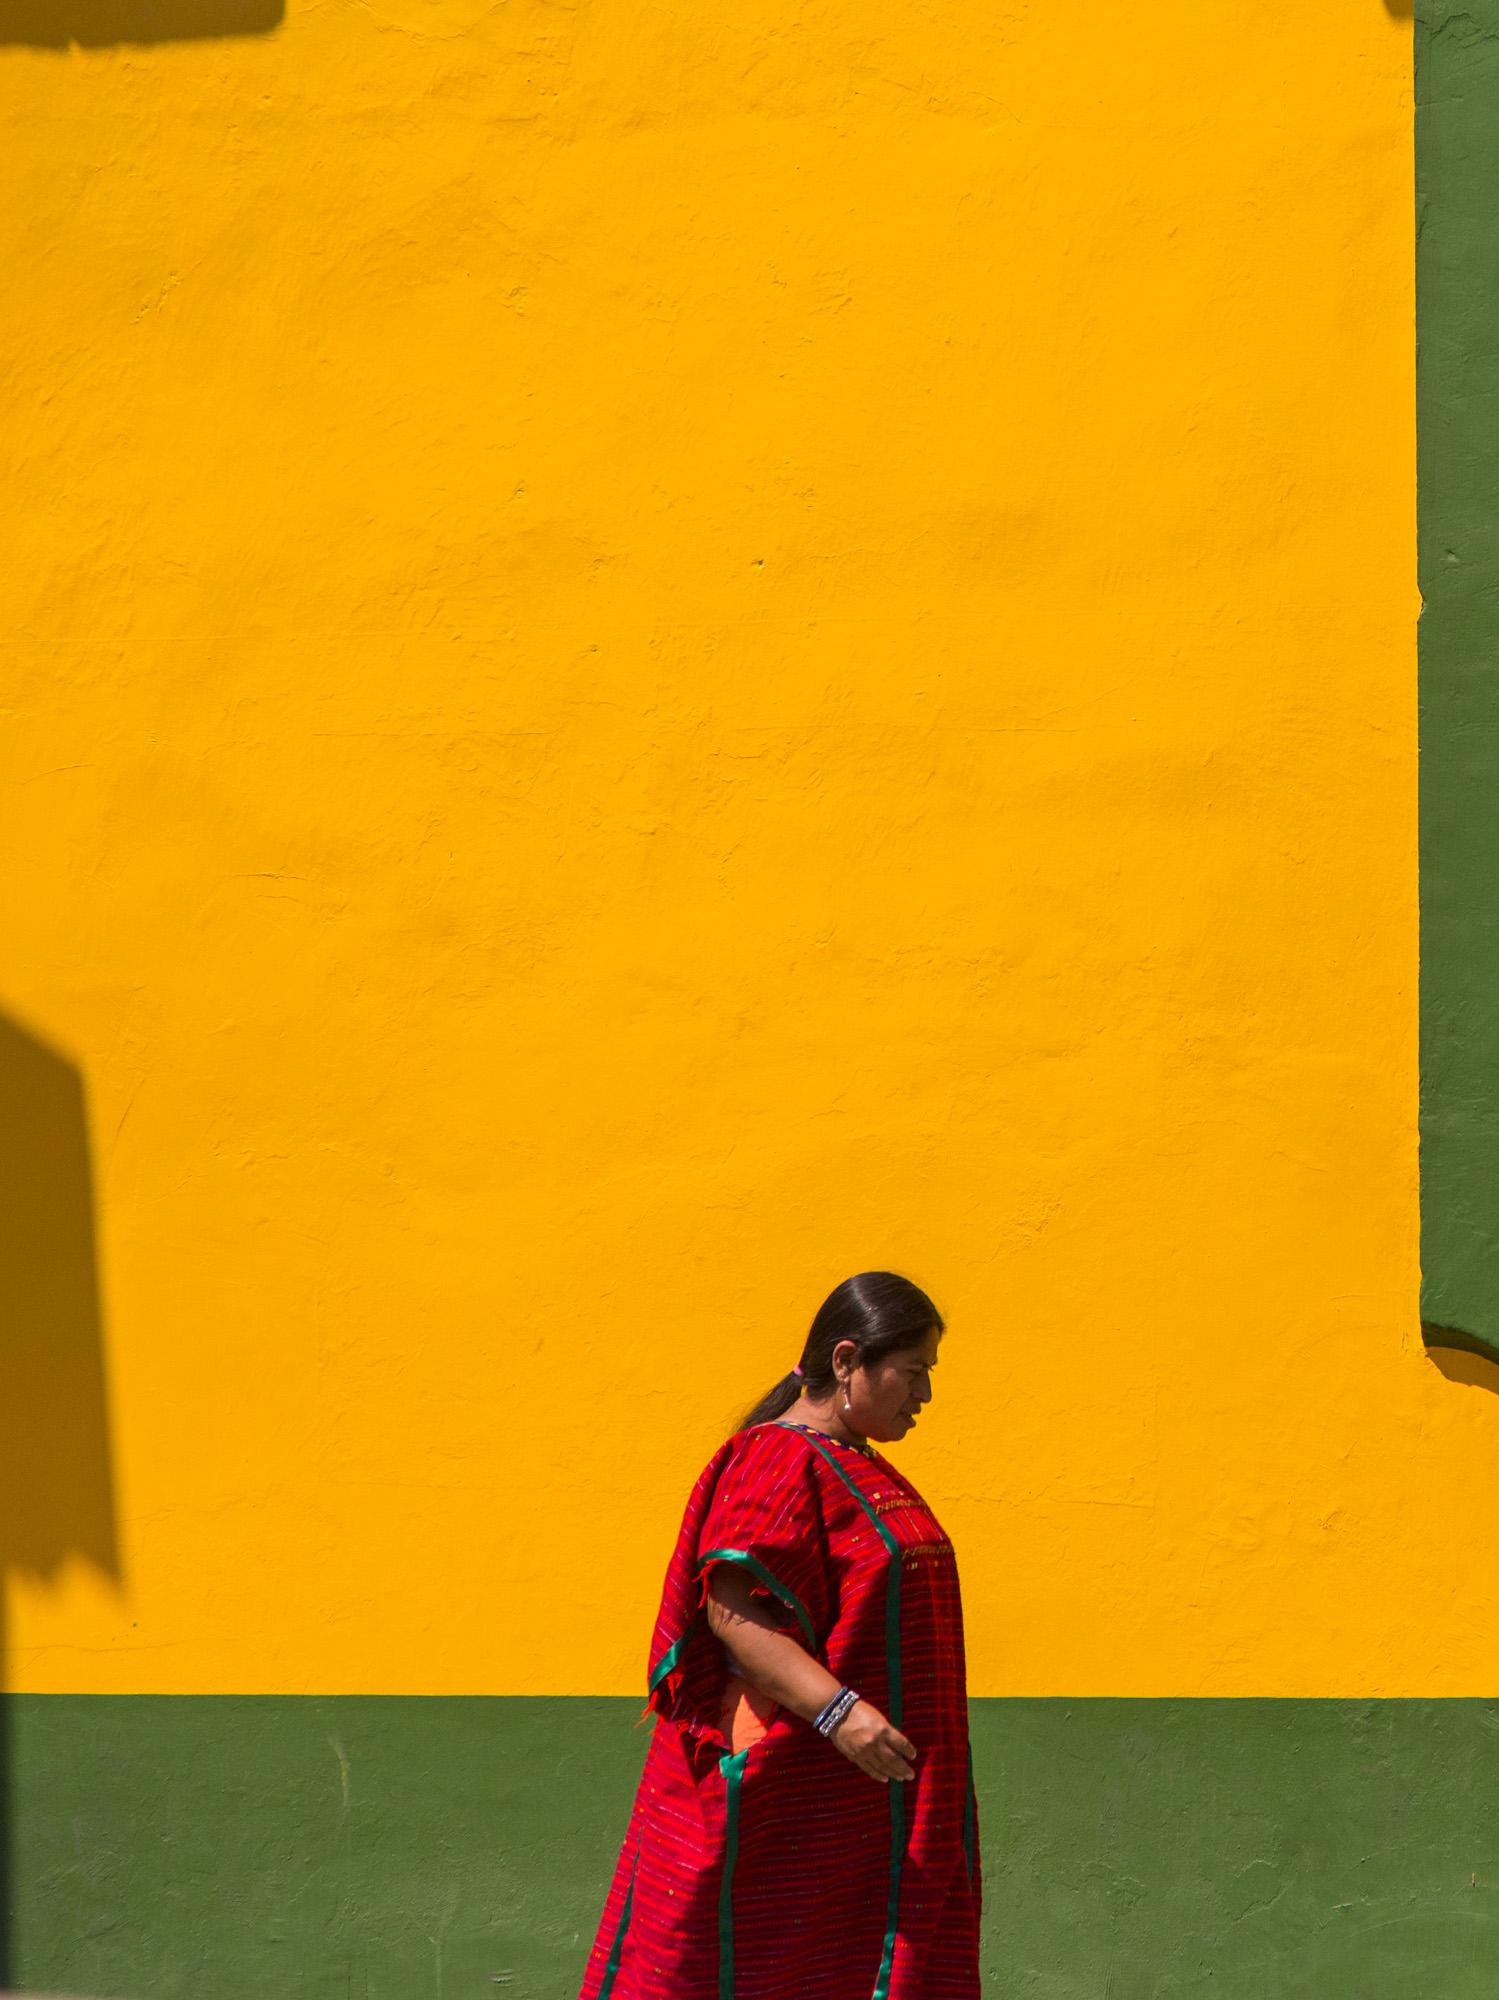 Woman in traditional dress, Oaxaca, Mexico